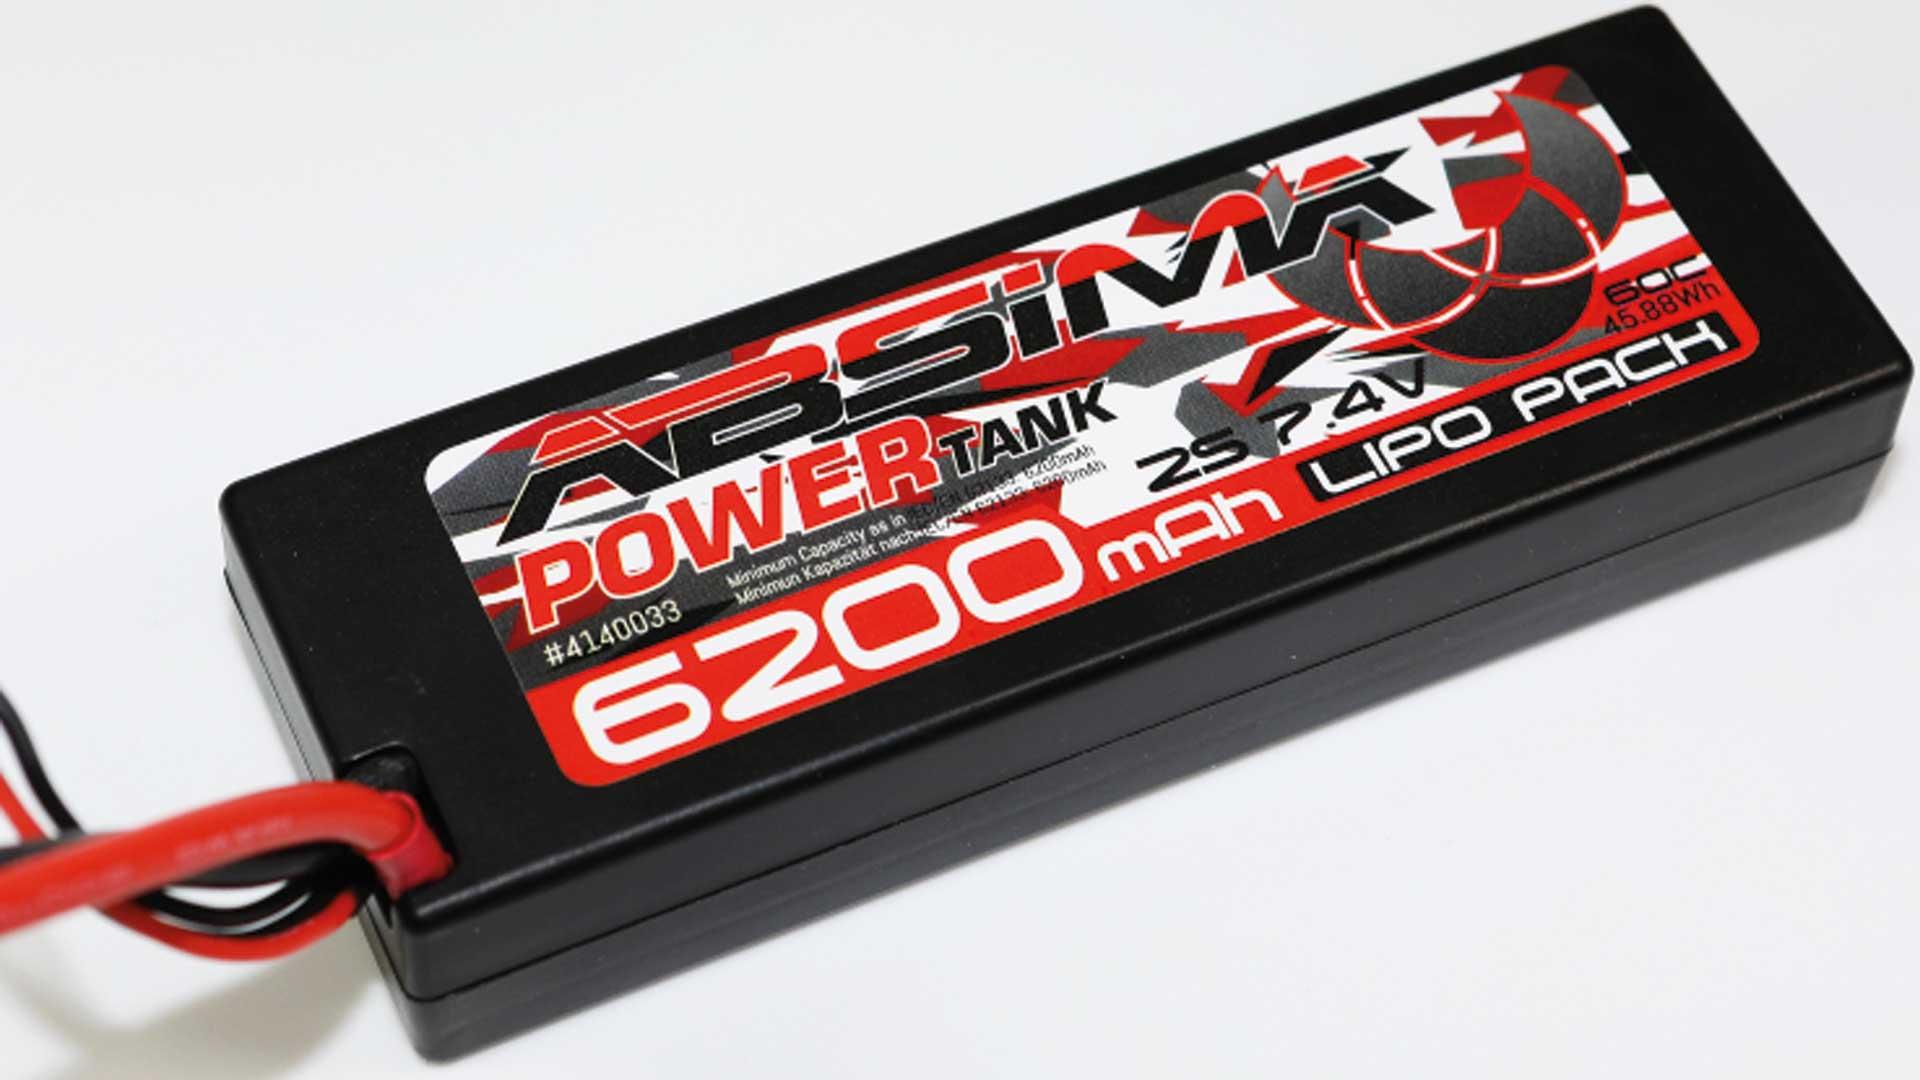 Absima Power Tank LiPo Stick Pack 7.4V-60C6200 Hardcase (T-Plug)